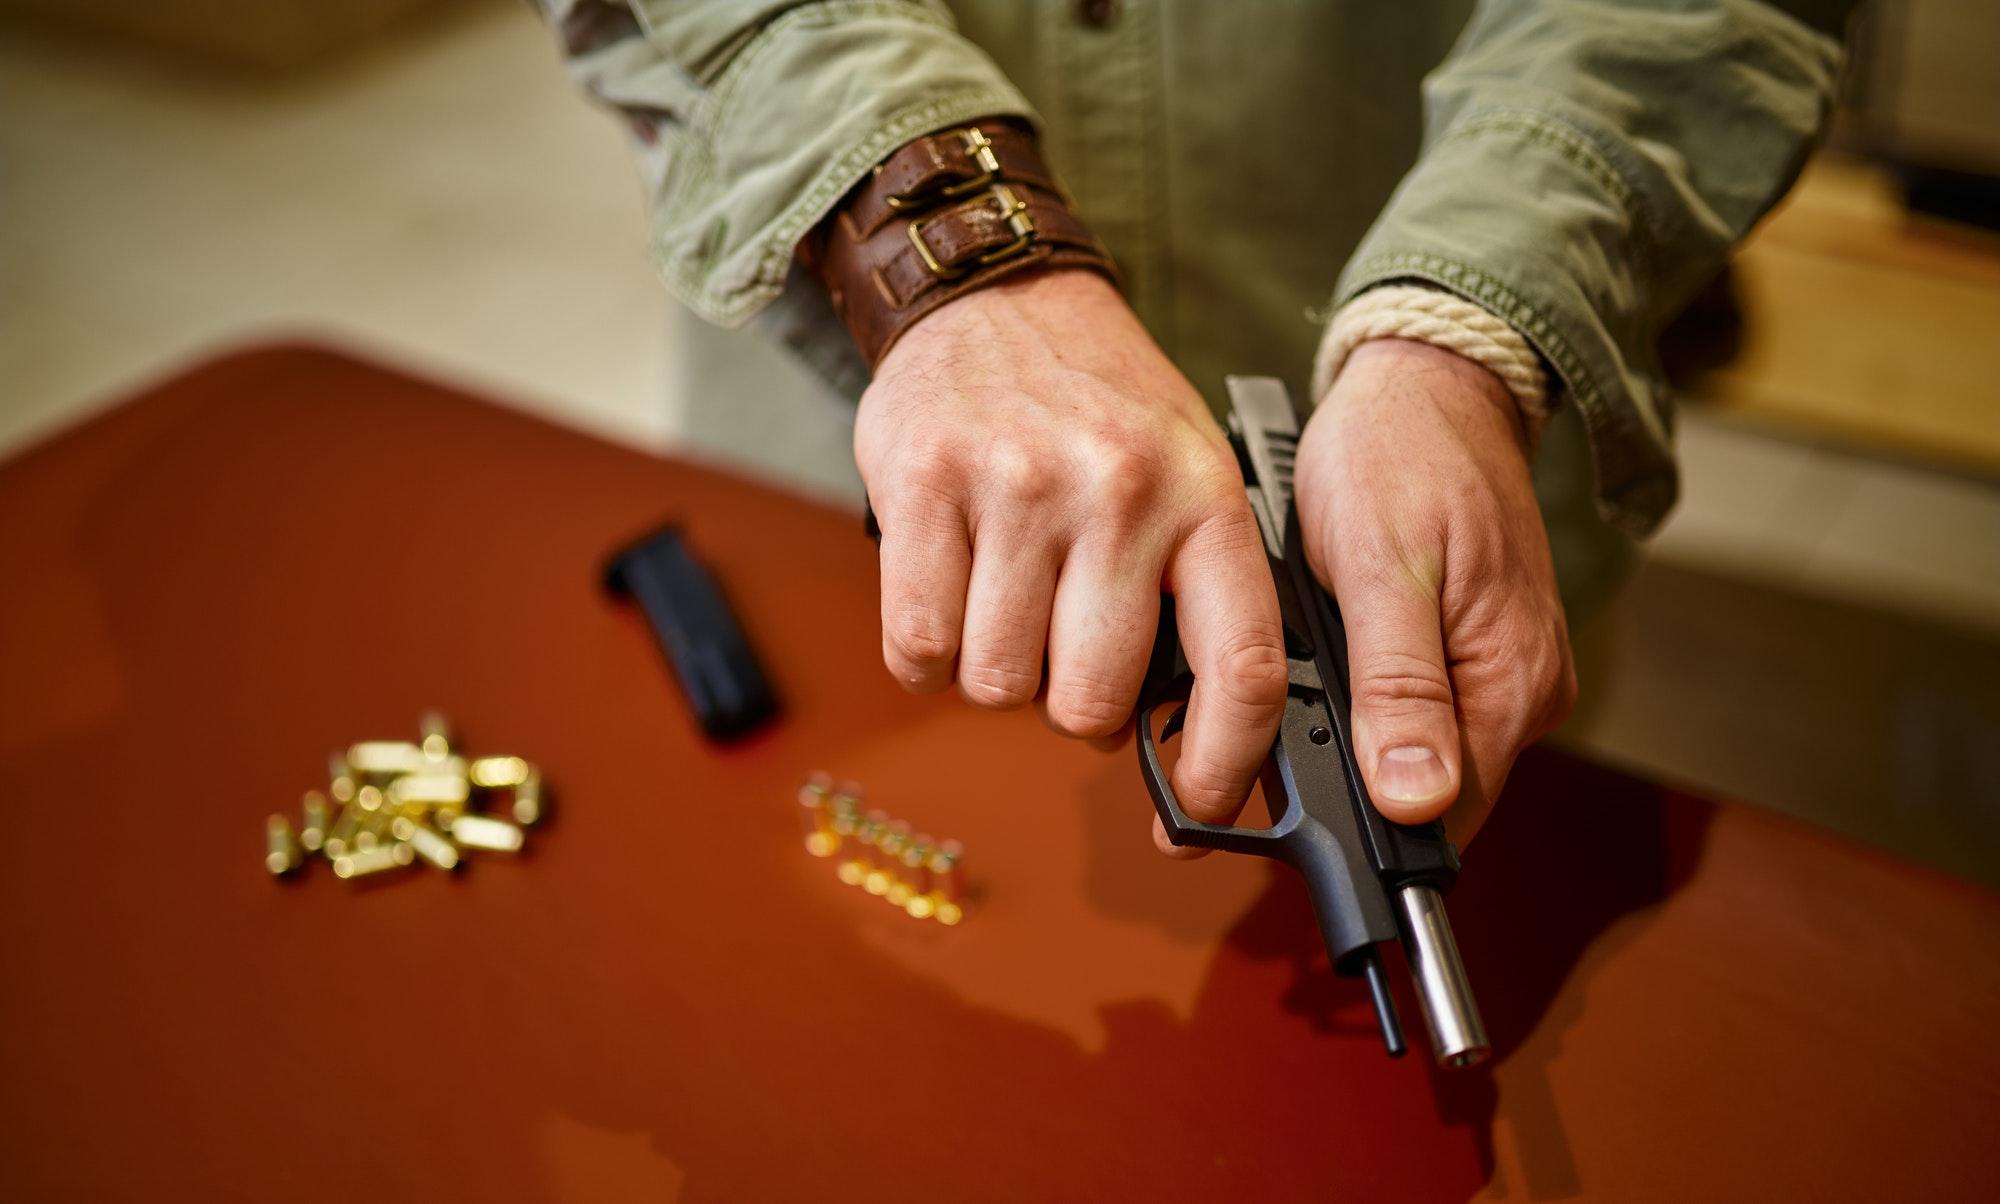 Man loads the gun with bullets in gun store